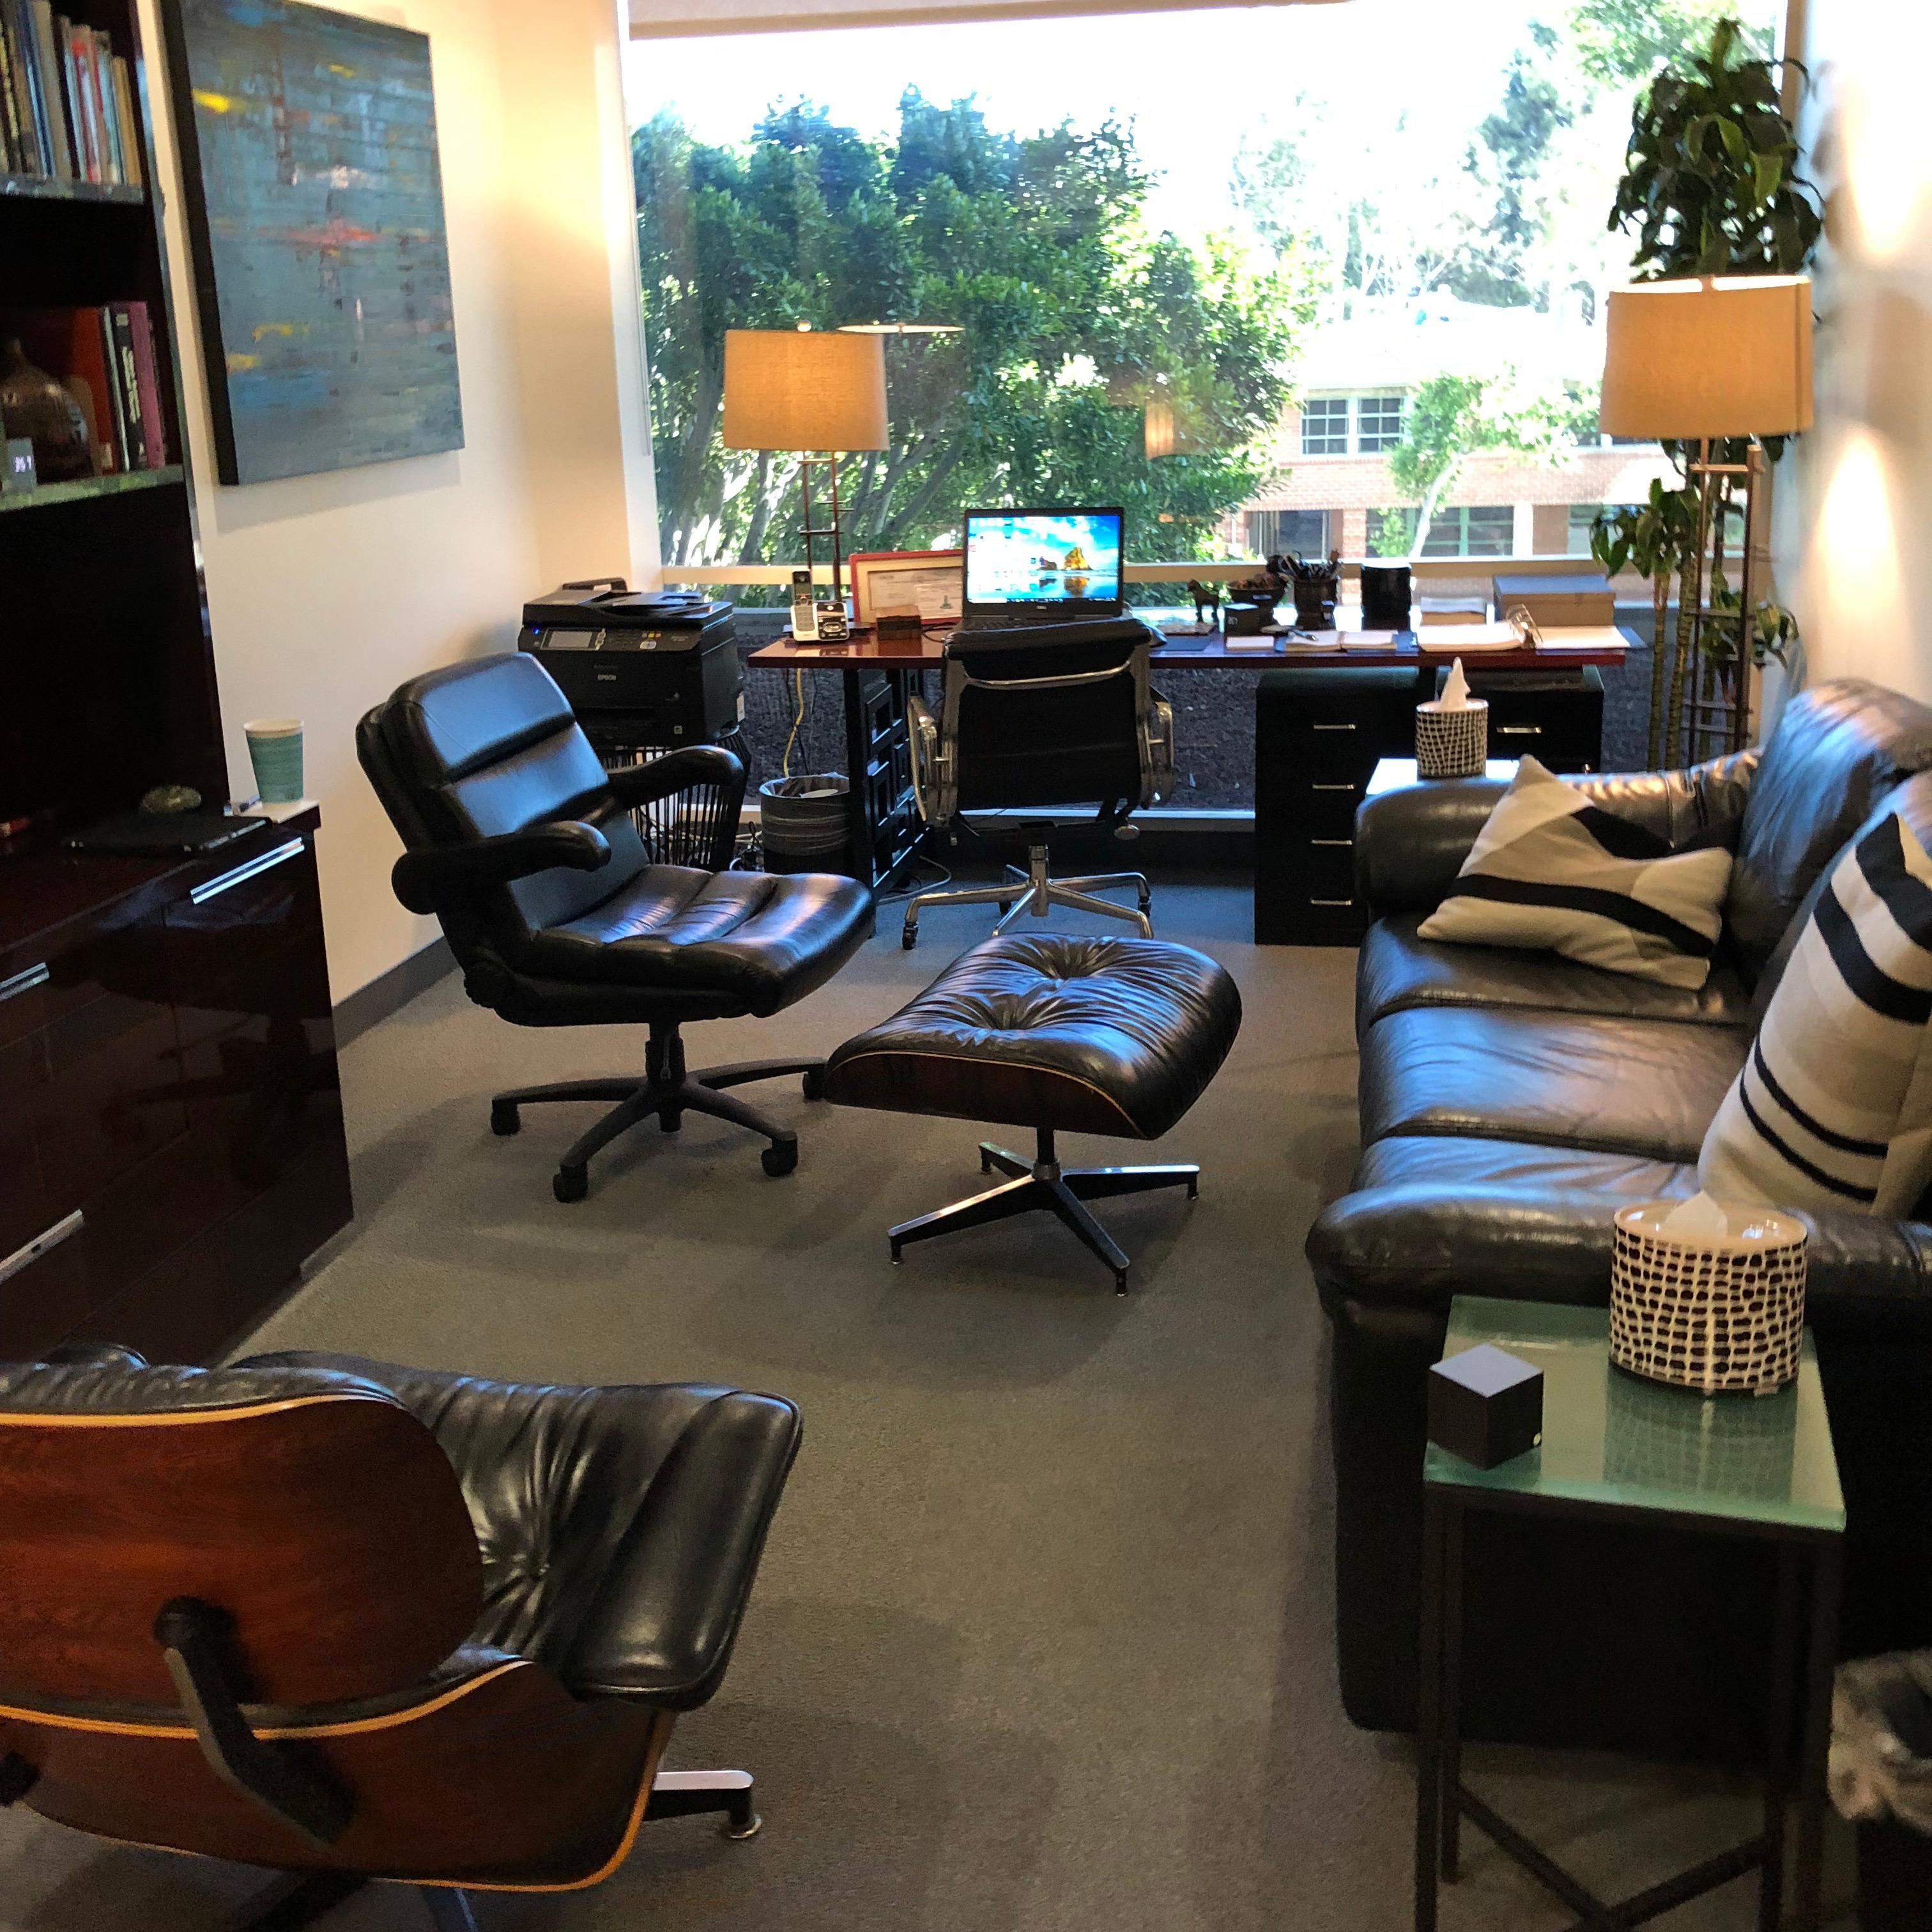 Psychotherapist Dr. Bill Cloke's Brentwood Office